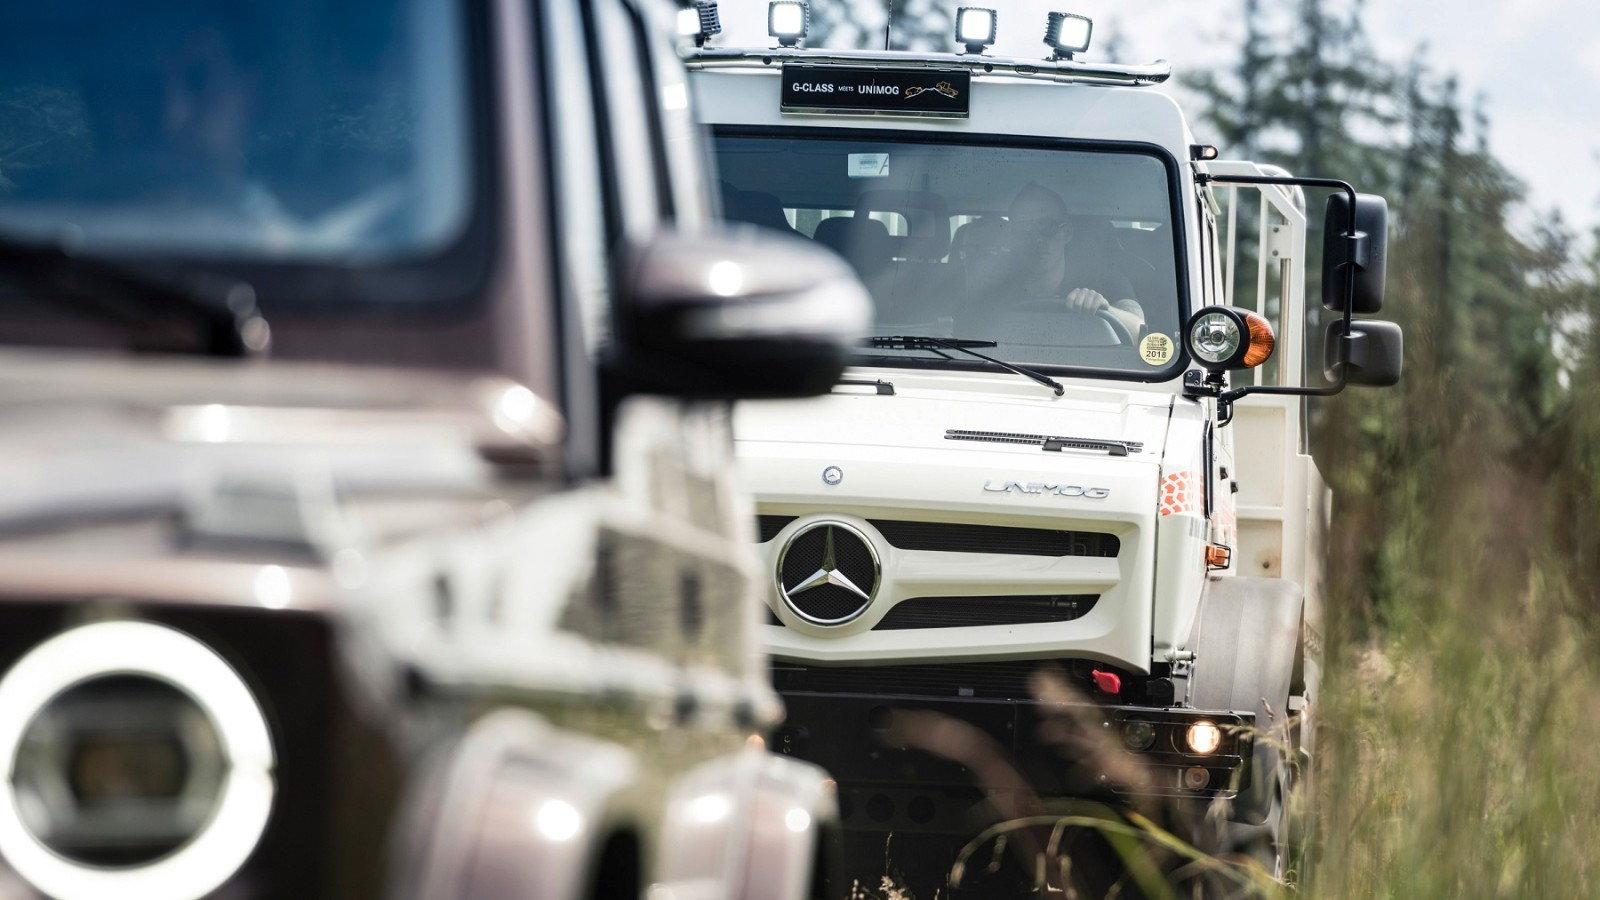 Unimog meets G-Class: A Summit of Mercedes-Benz's Off-Road